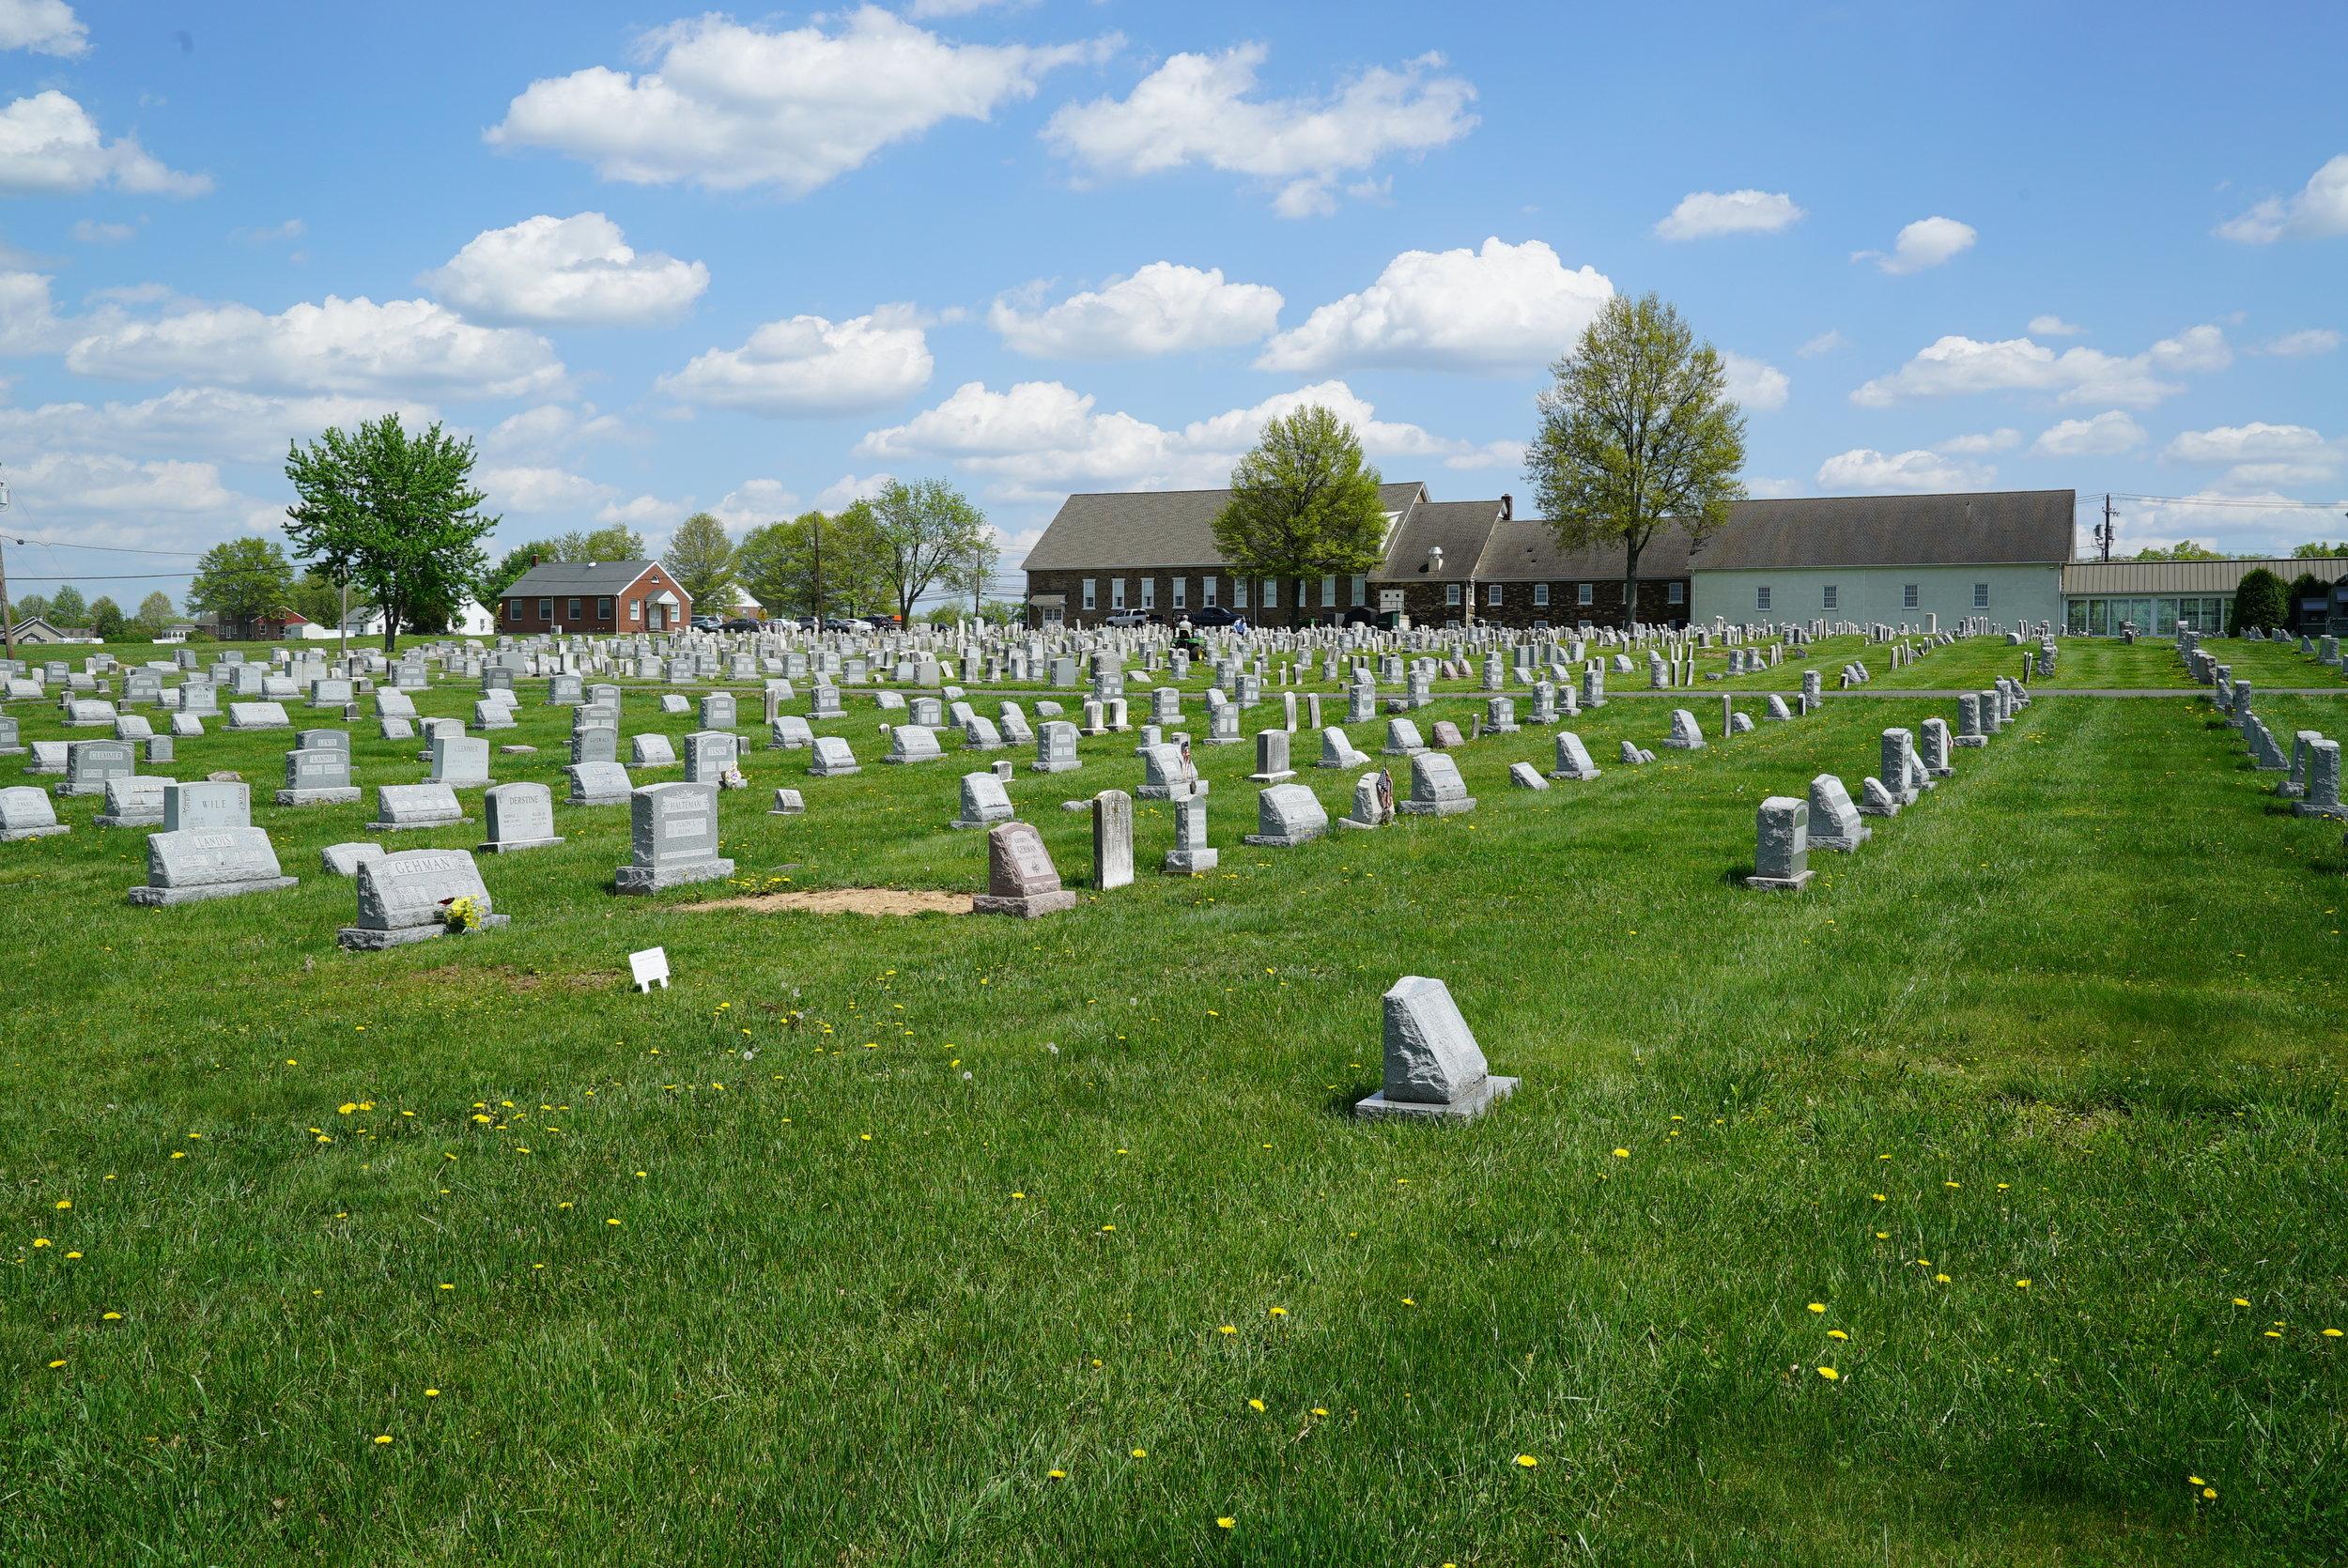 Franconia Mennonite Church Cemetery. Telfor, Pennsylvania.